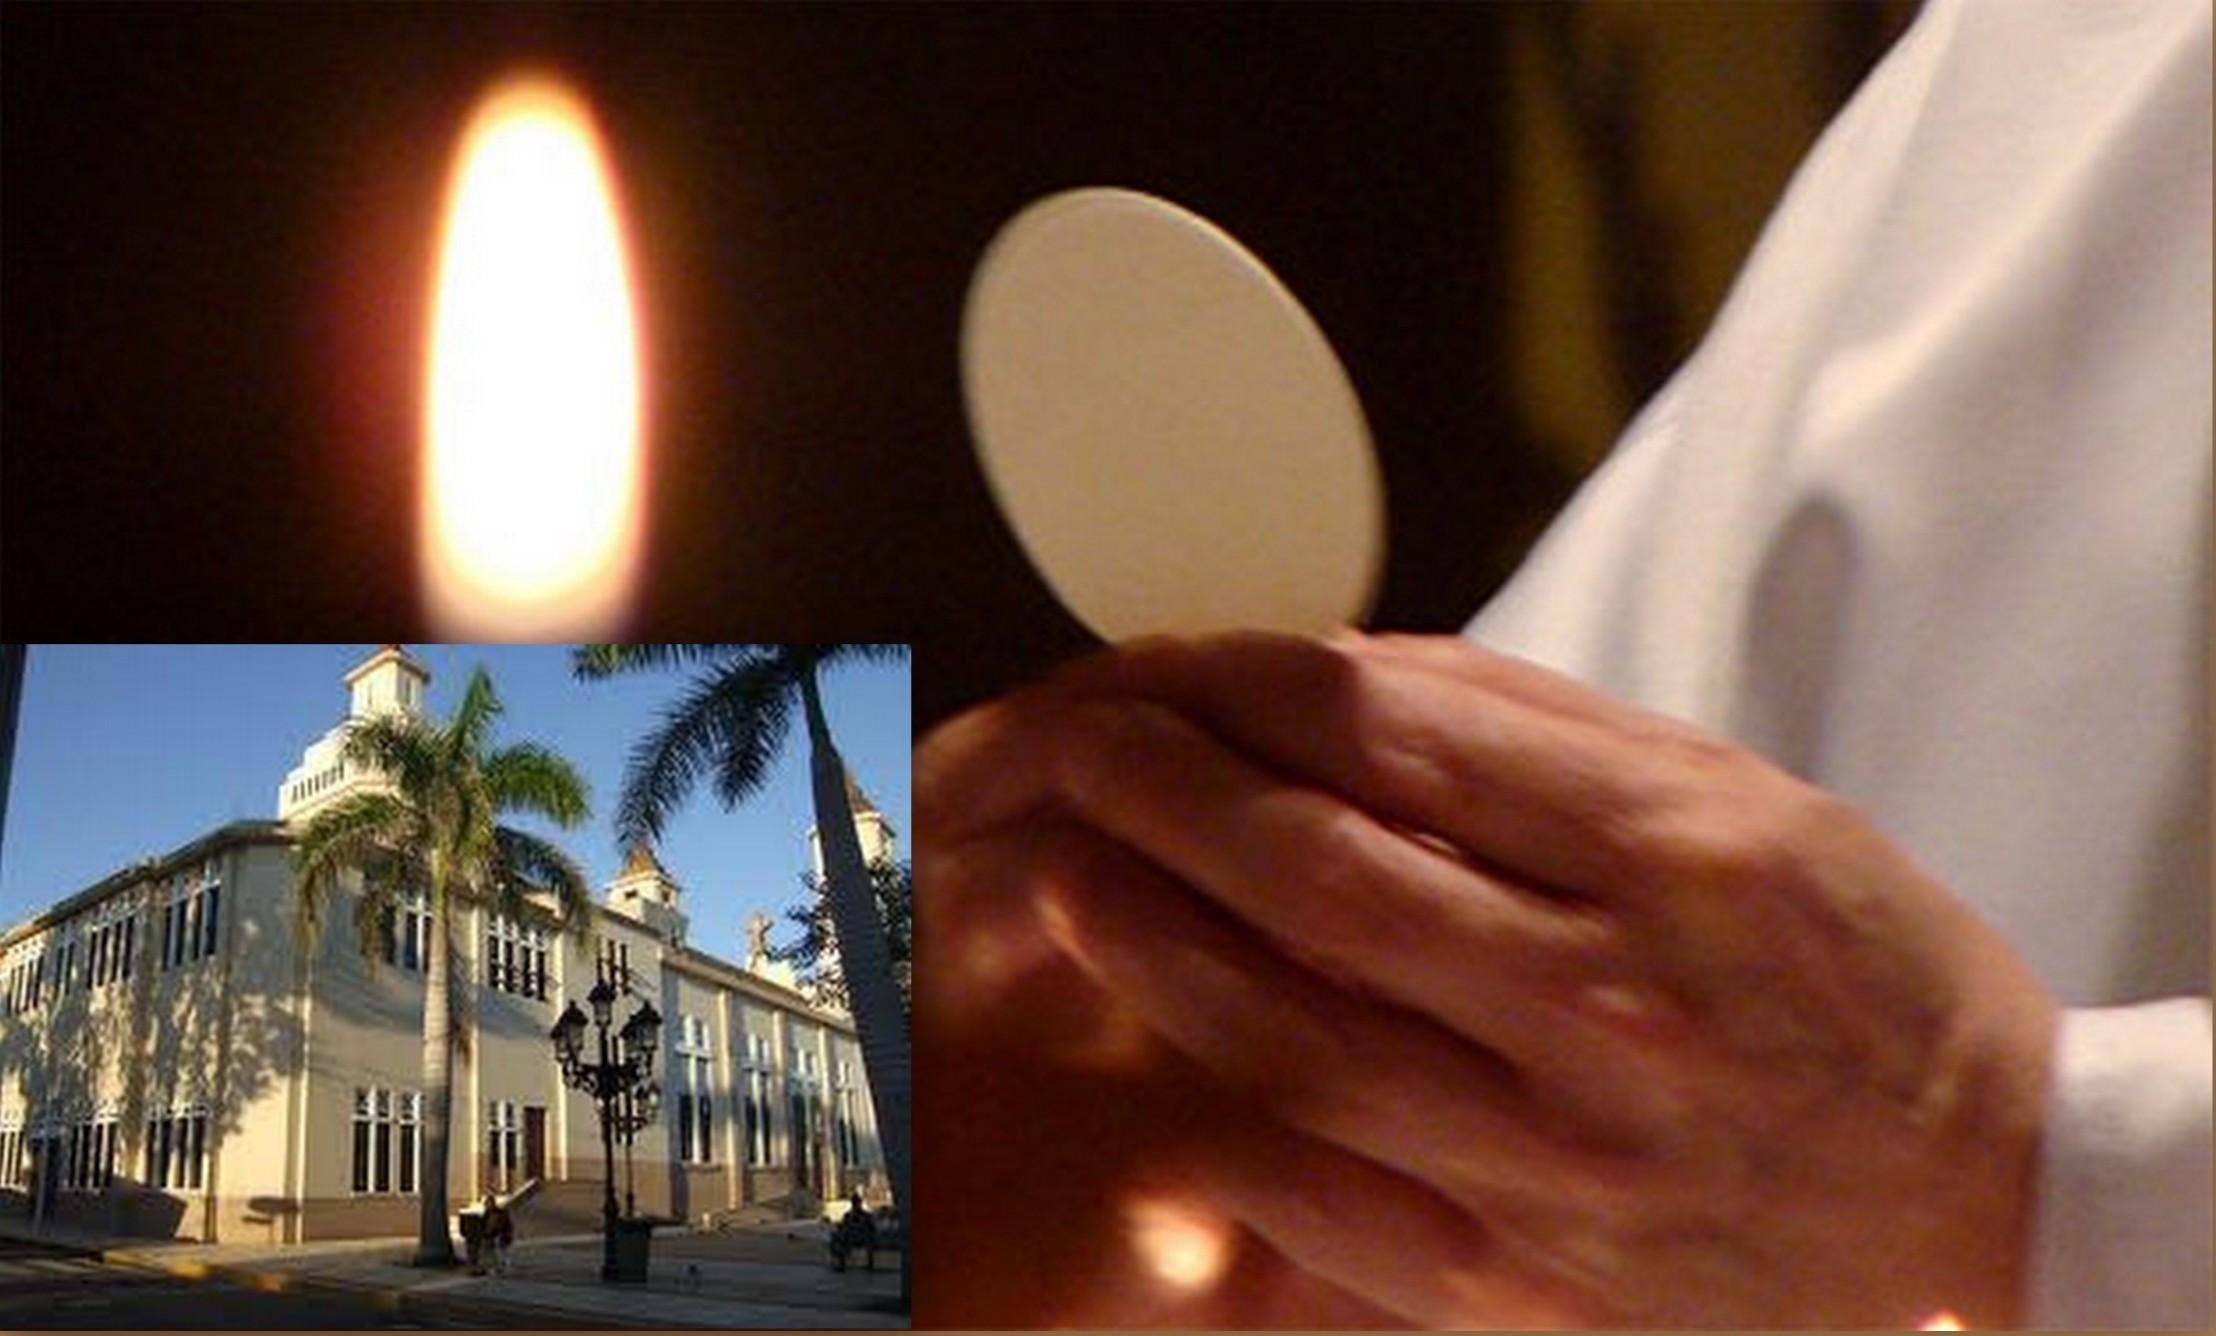 Diócesis Puerto Plata Invita feligresía participar en actos Corpus Christi.